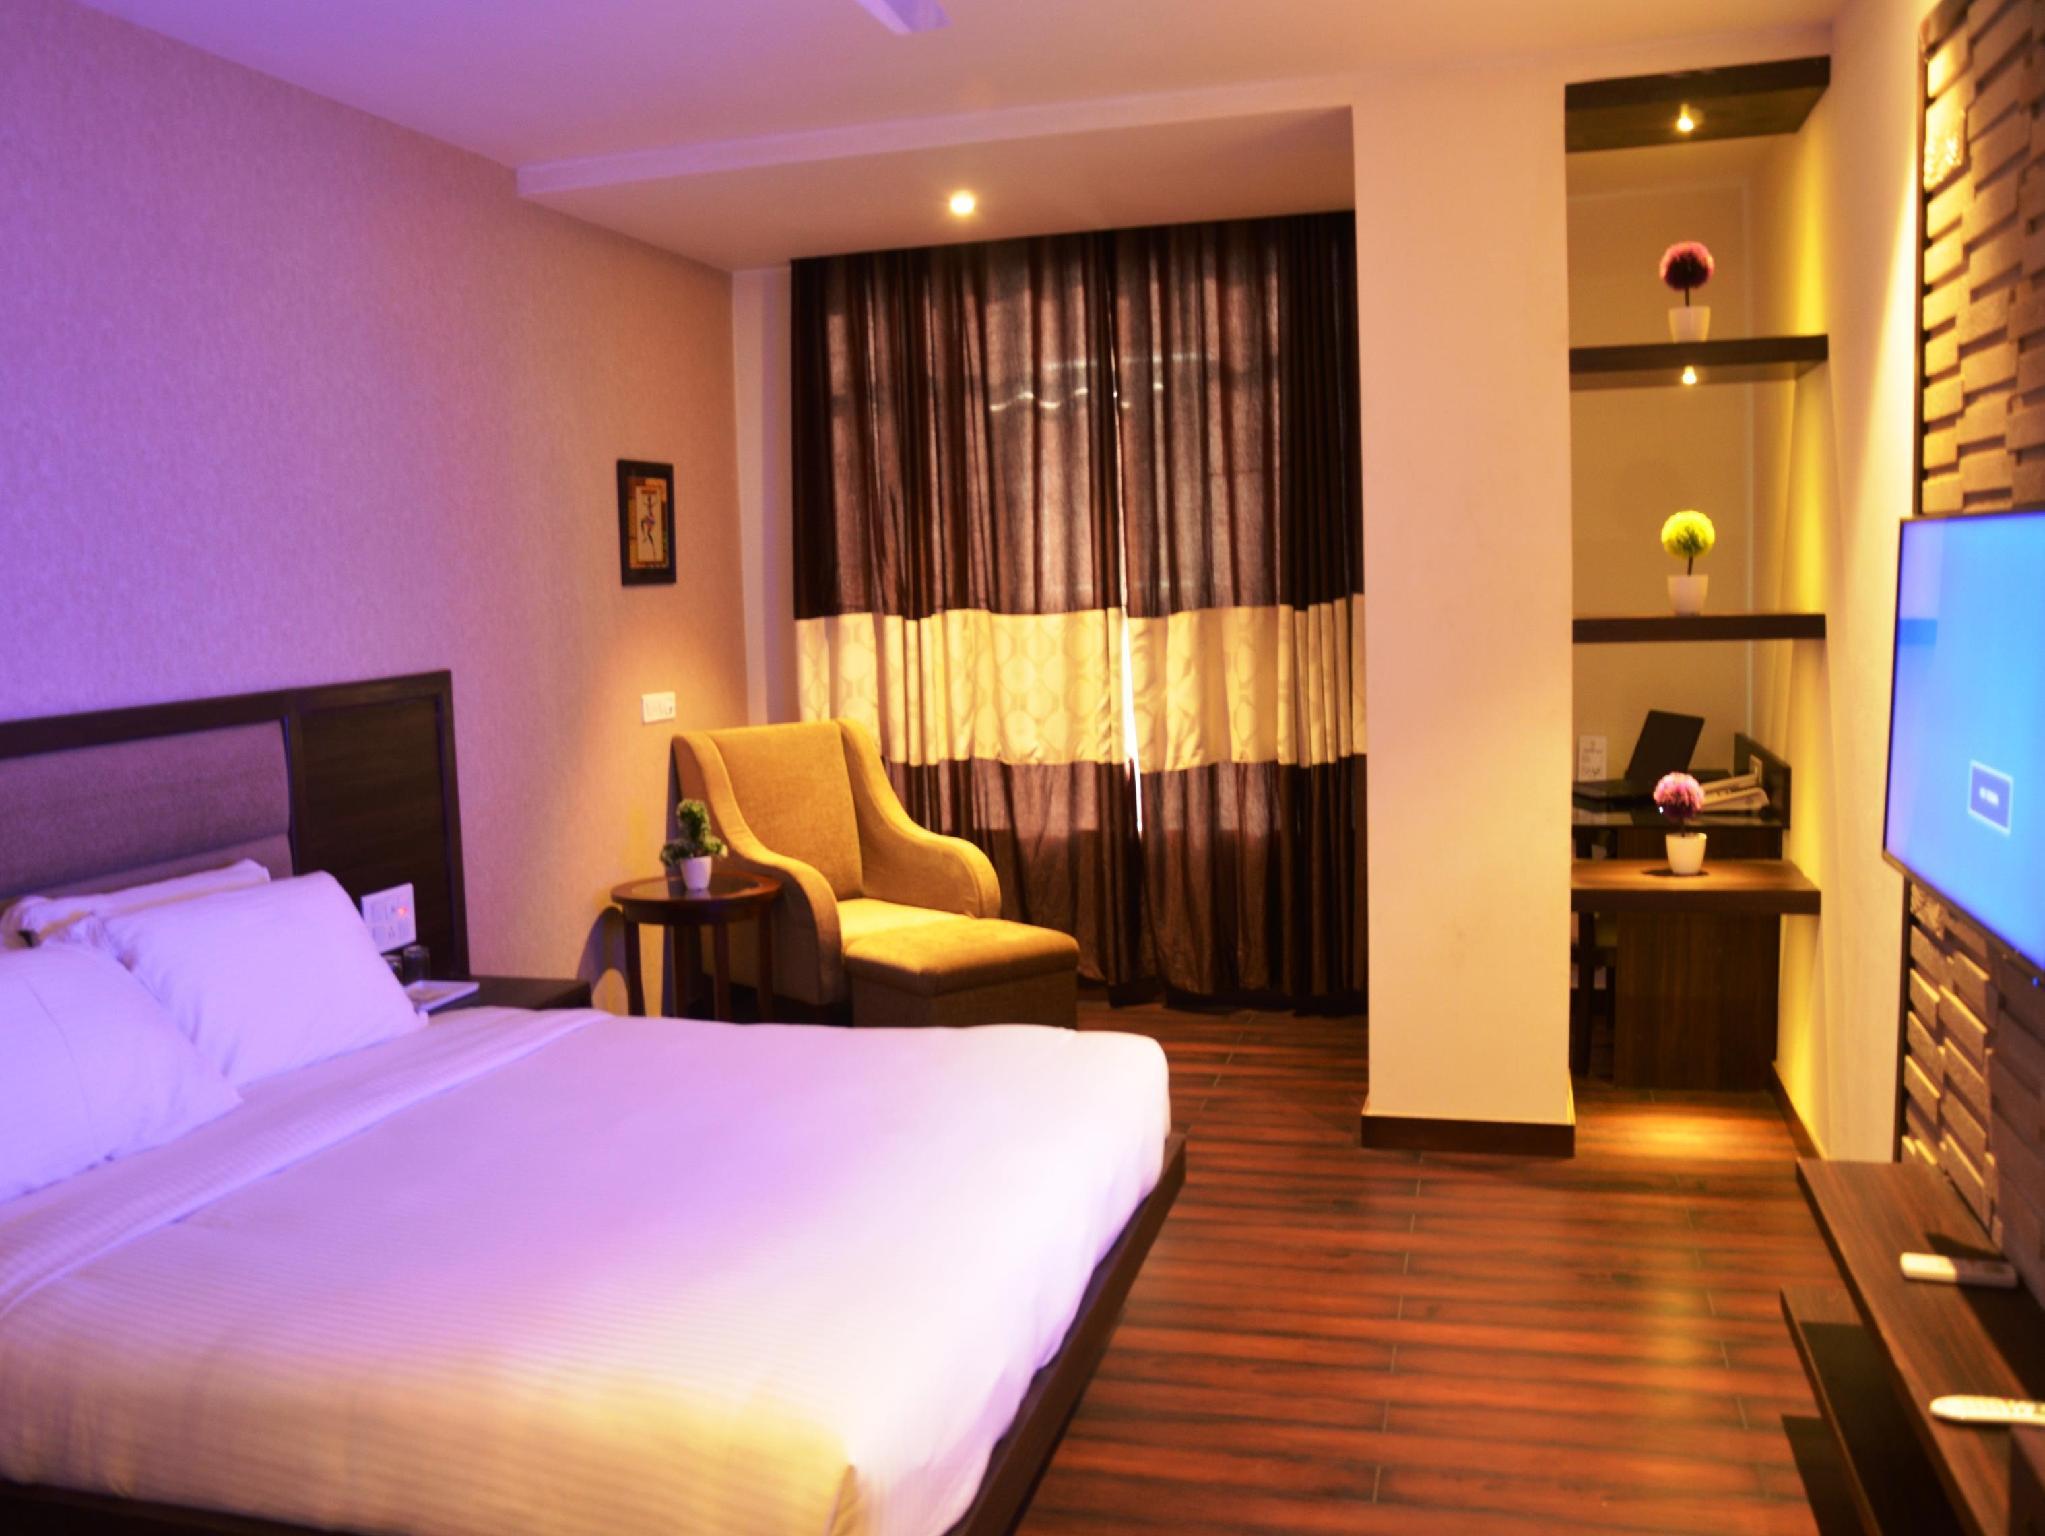 Hotel Fortune Blue, Sikar